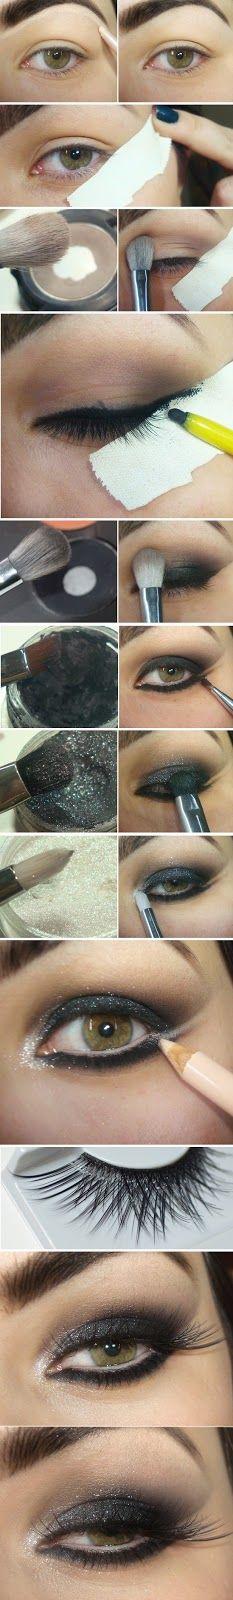 Black Shine Cat Eye Makeup Tutorials - Step by Step / Best LoLus Makeup Fashion